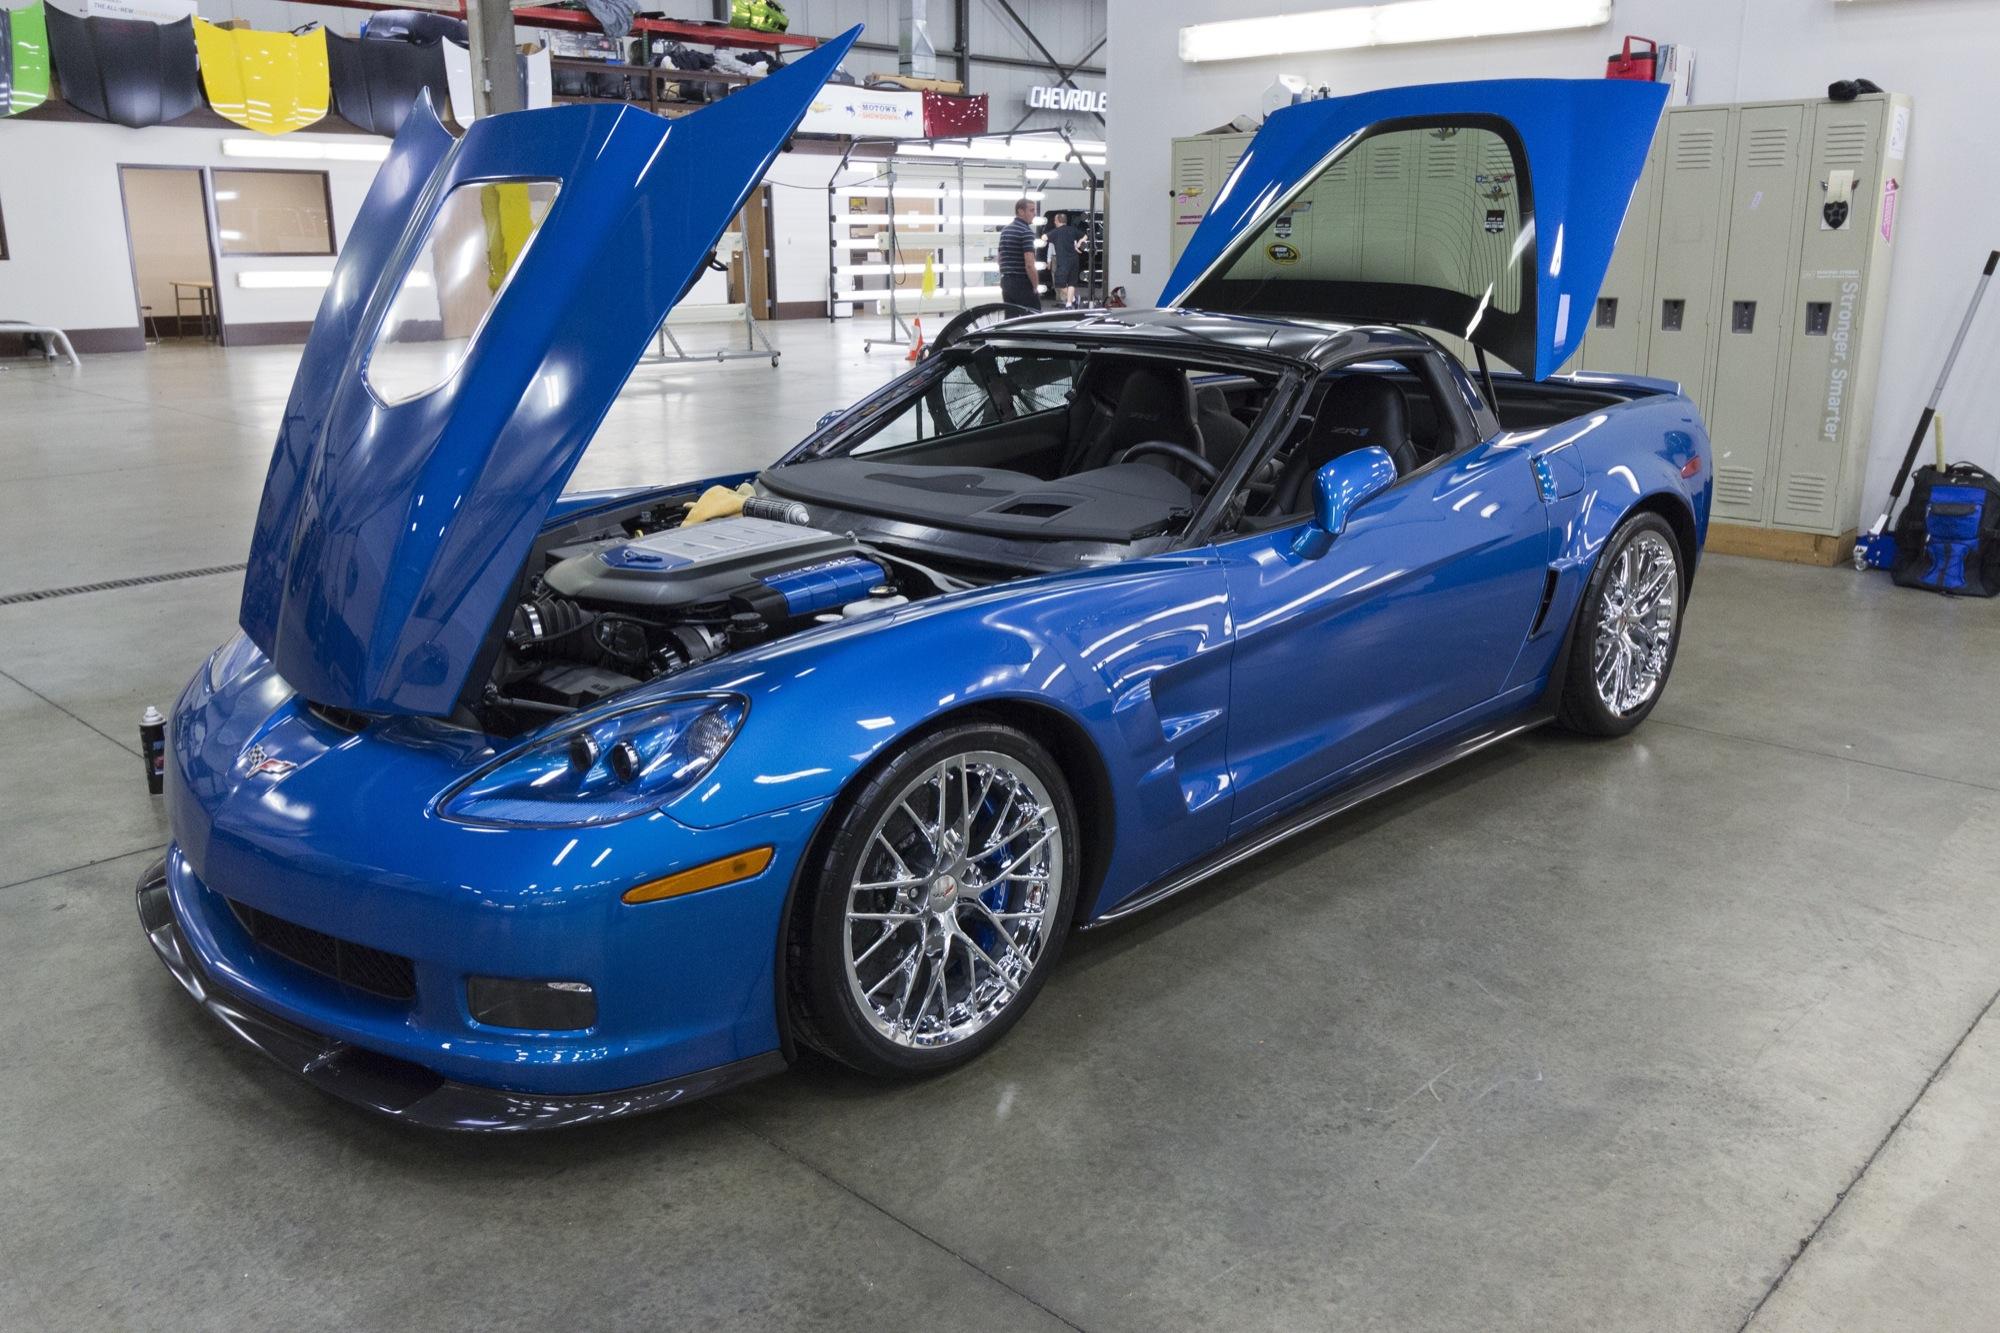 Спорткар Chevy Corvette ZR1 неувидят на автомобильном салоне вДетройте